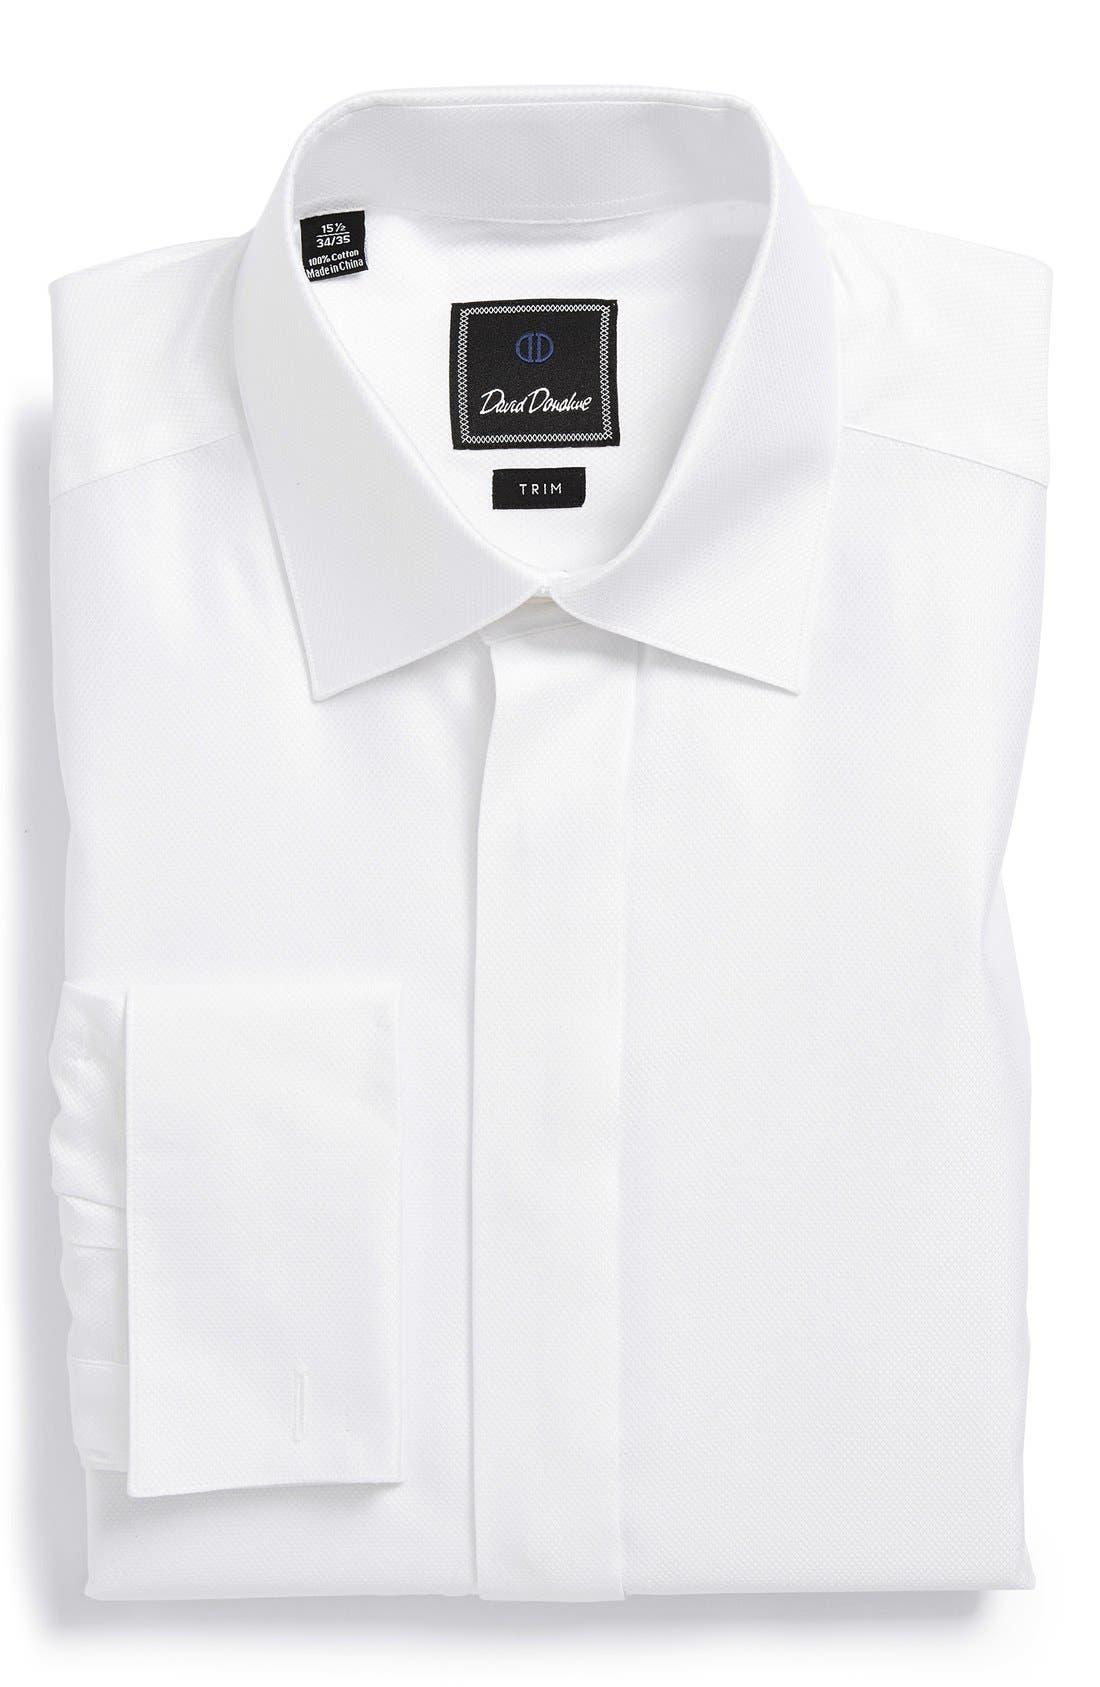 Trim Fit French Cuff Tuxedo Shirt,                             Main thumbnail 1, color,                             WHITE